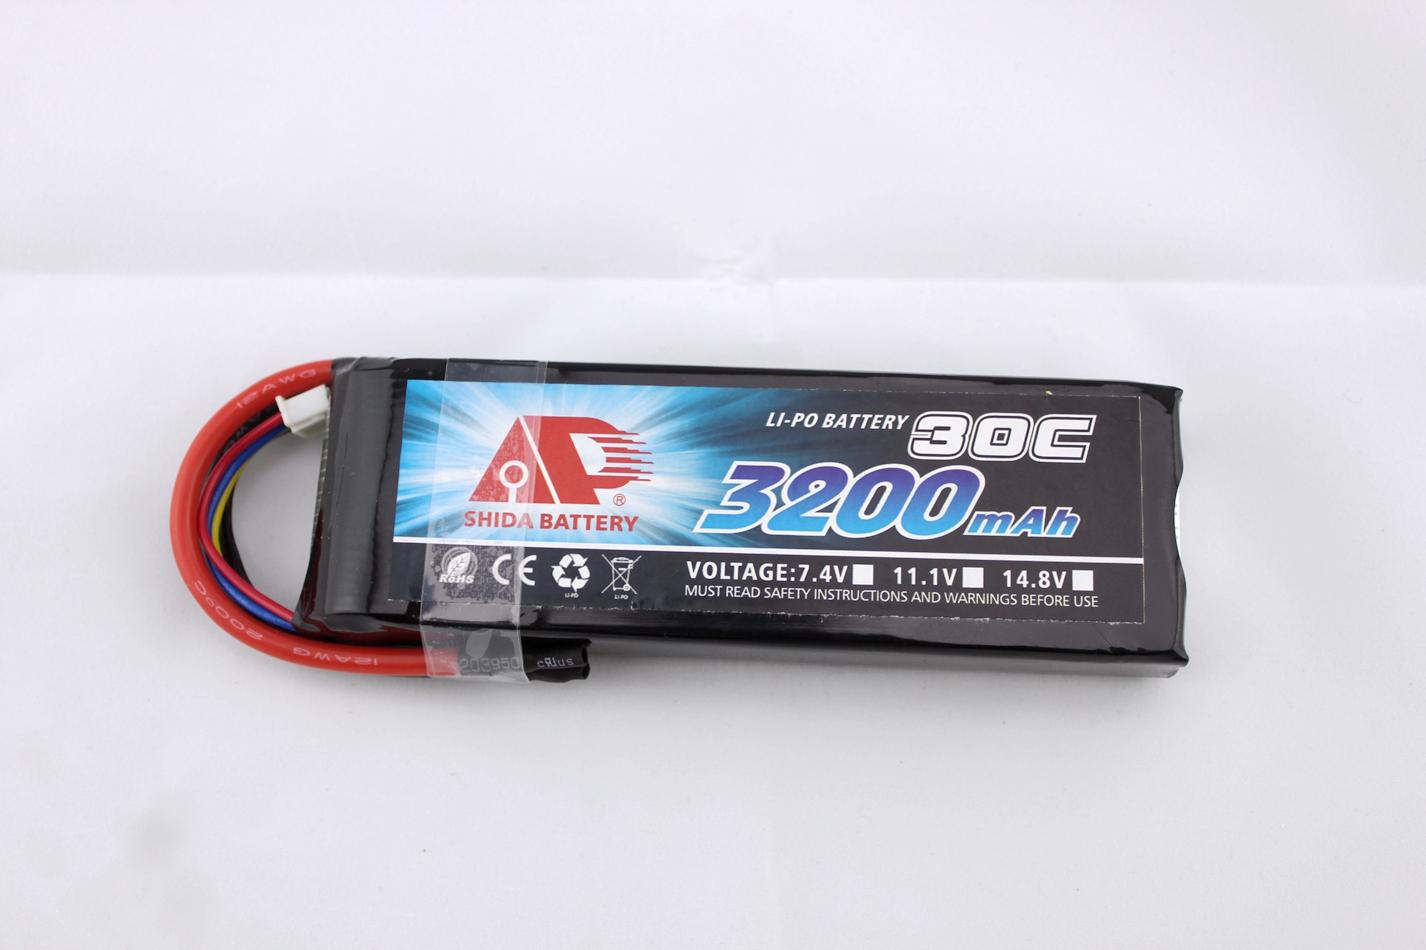 china supplier 3200mAh 30C 11.1V lipo battery for airplane